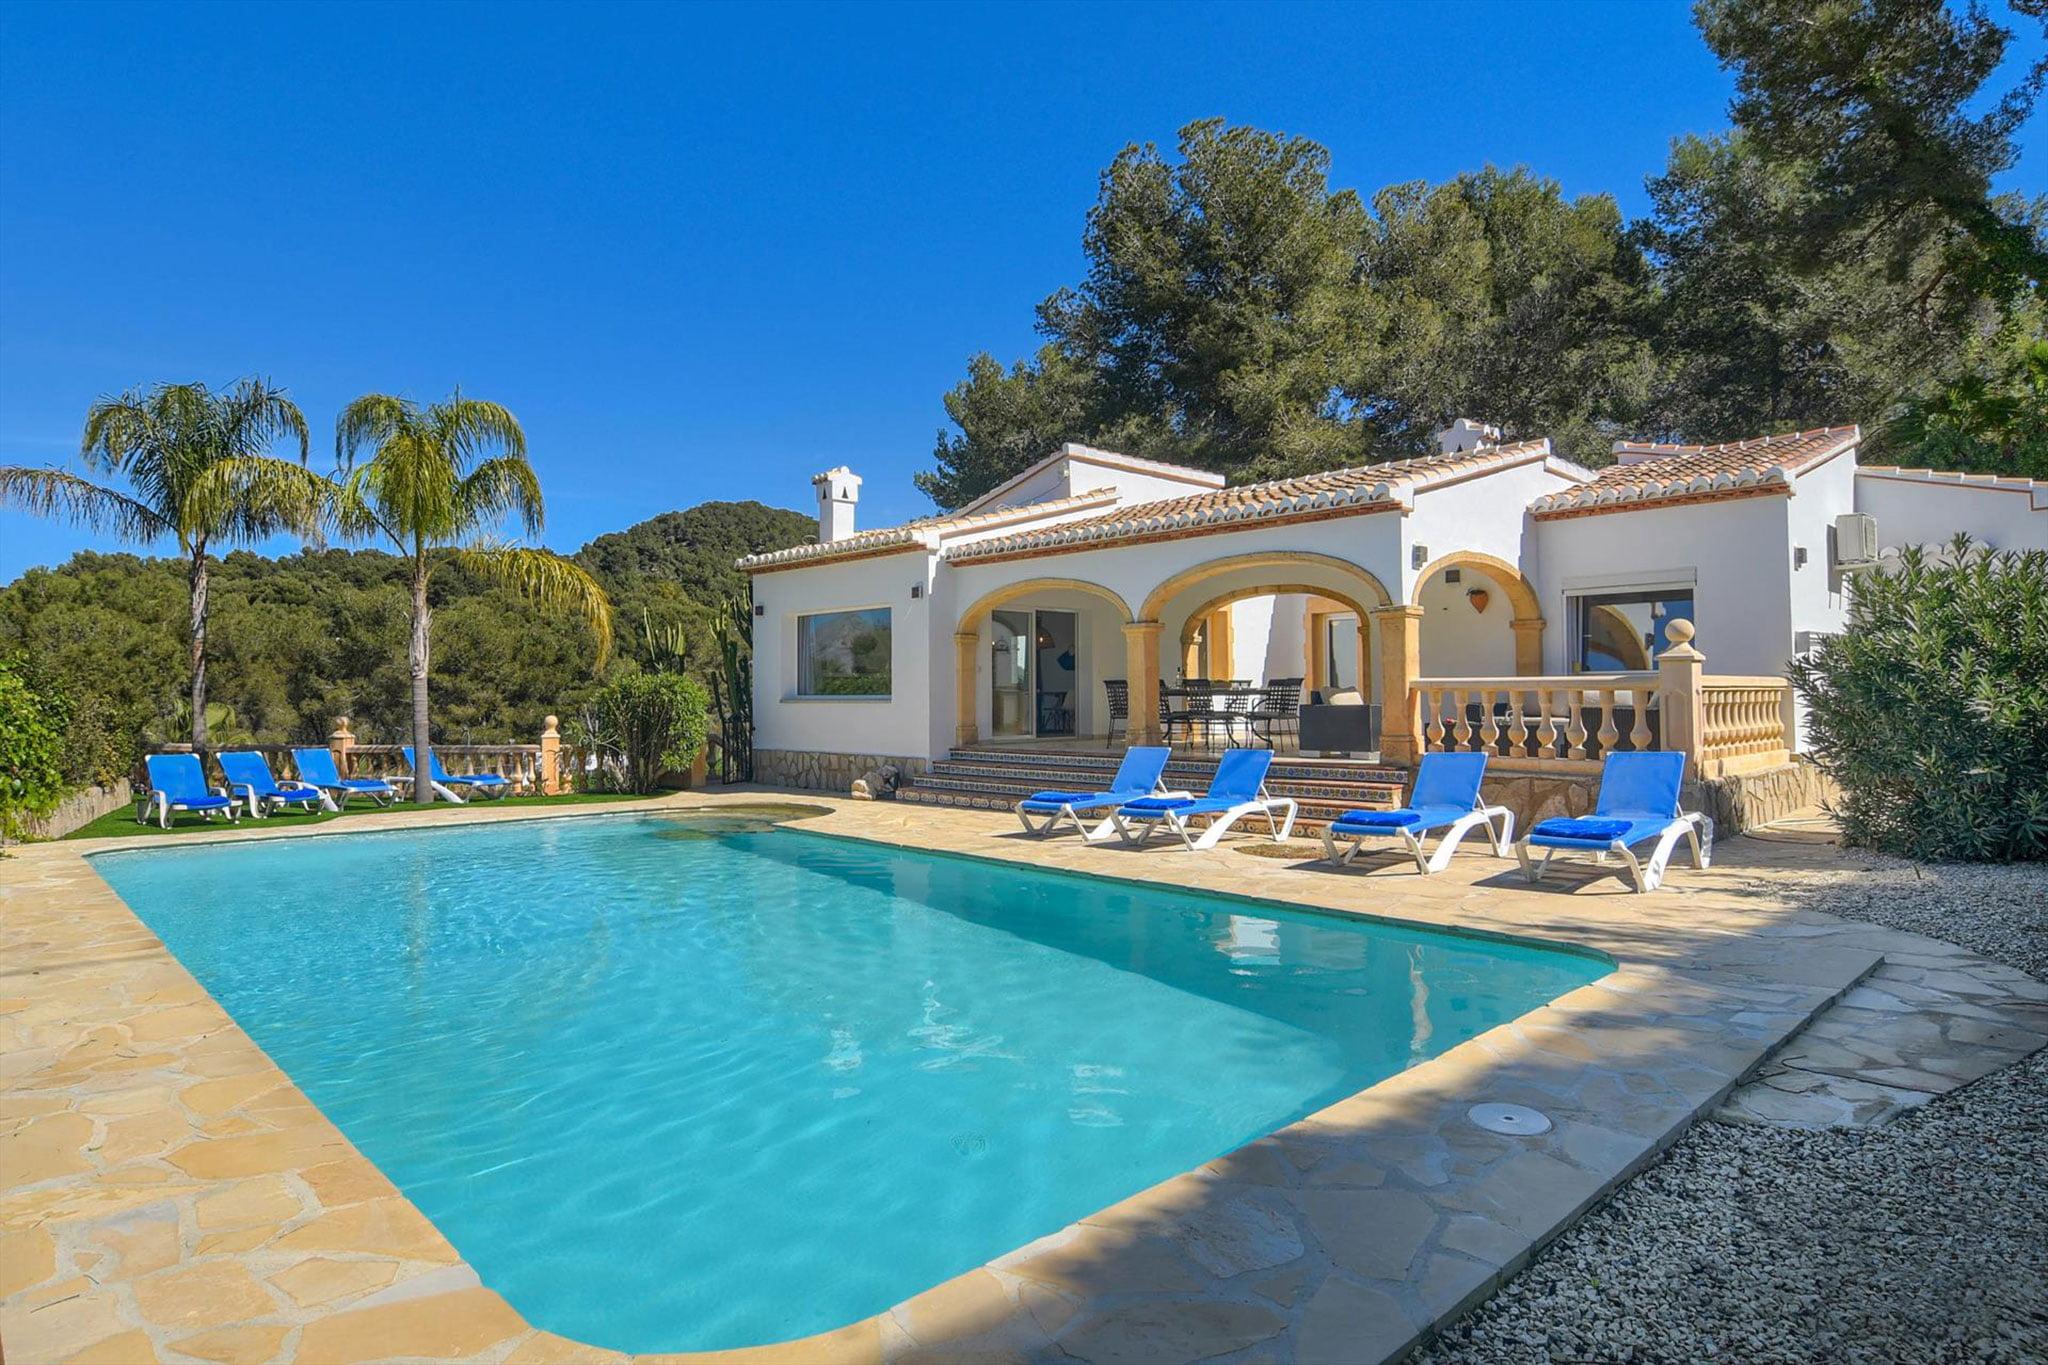 Gran casa de alquiler para vacaciones en Jávea – Aguila Rent a Villa